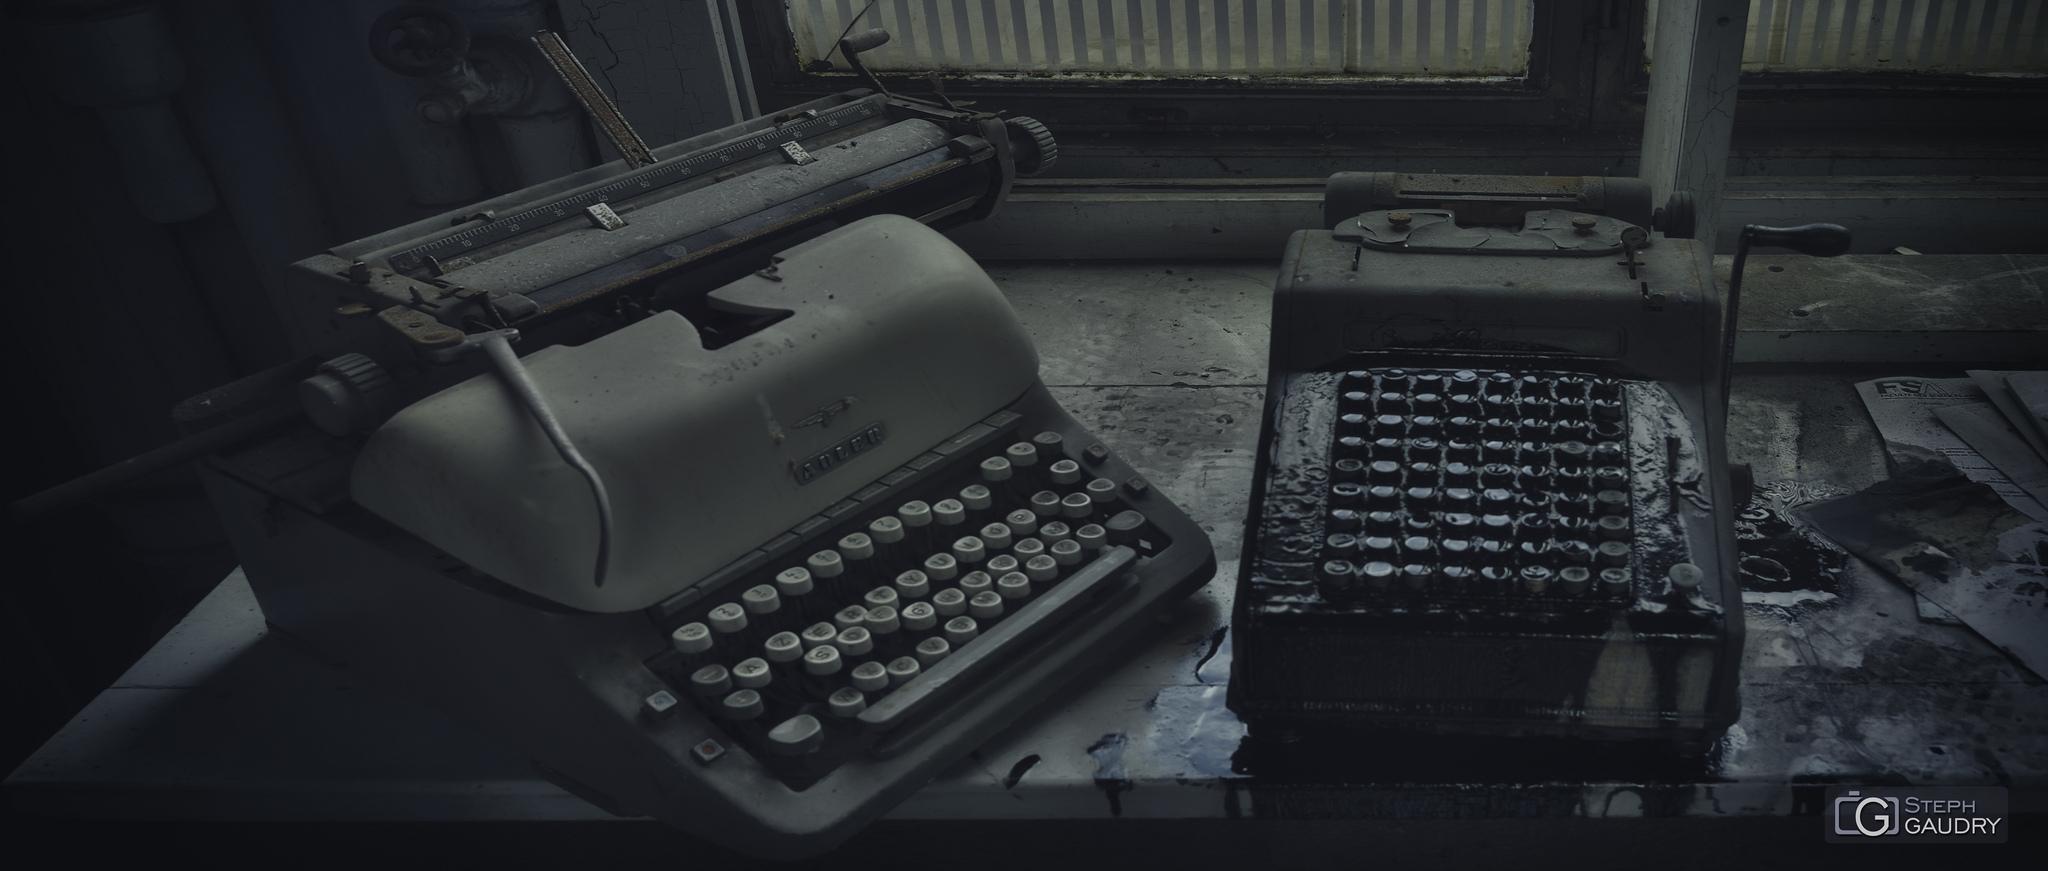 Adler typewriter [Cliquez pour lancer le diaporama]